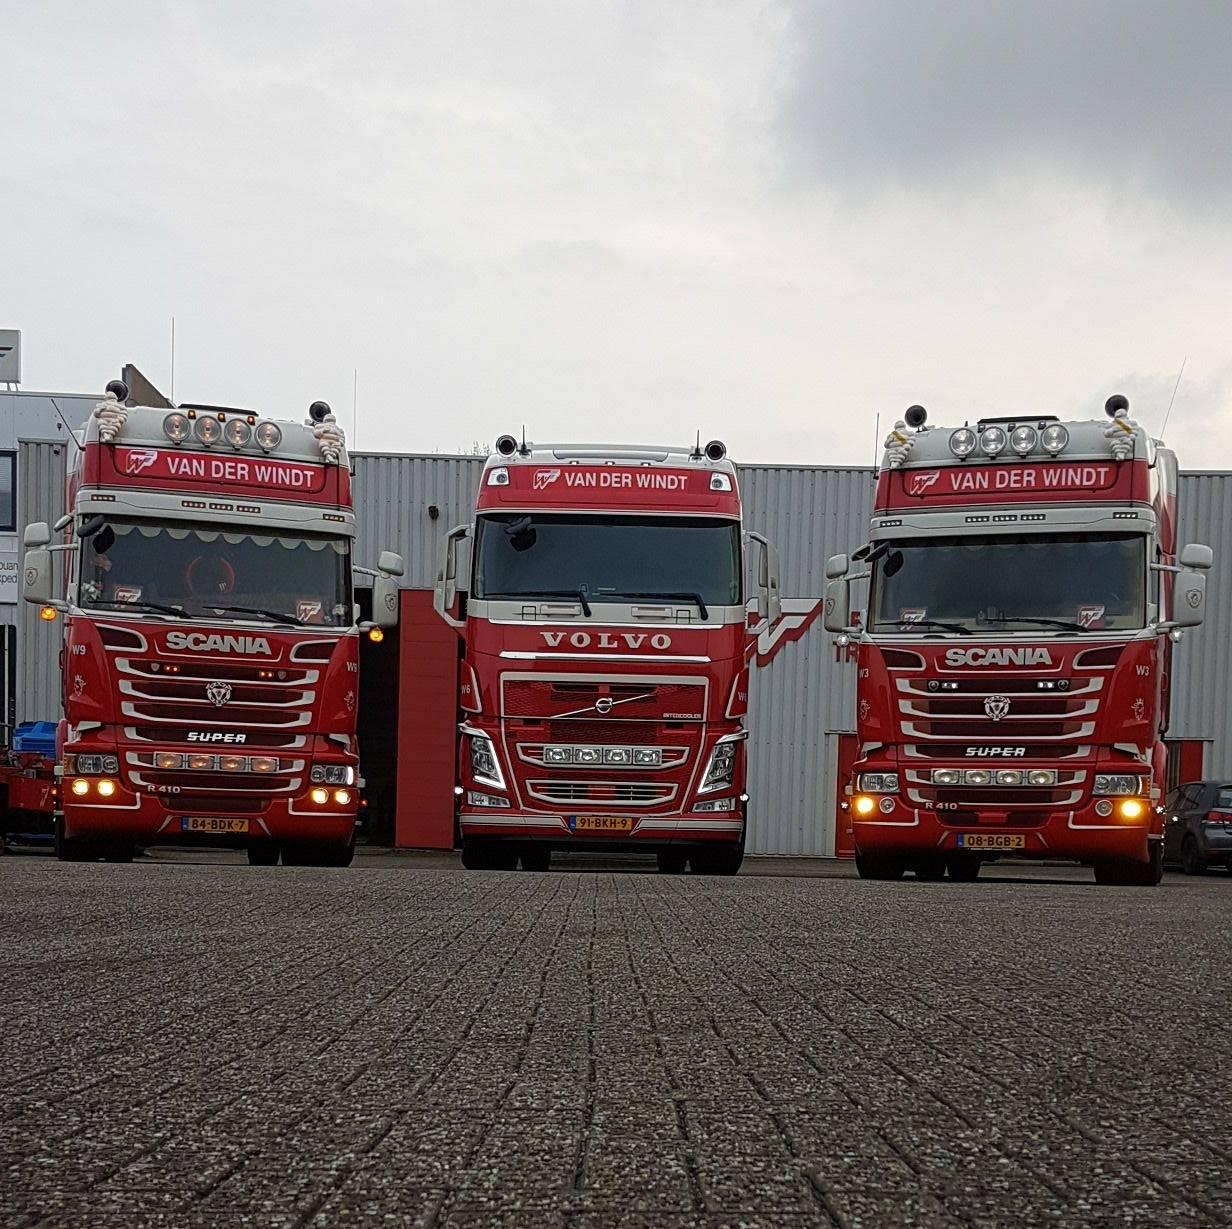 Scania-Volvo-Scania